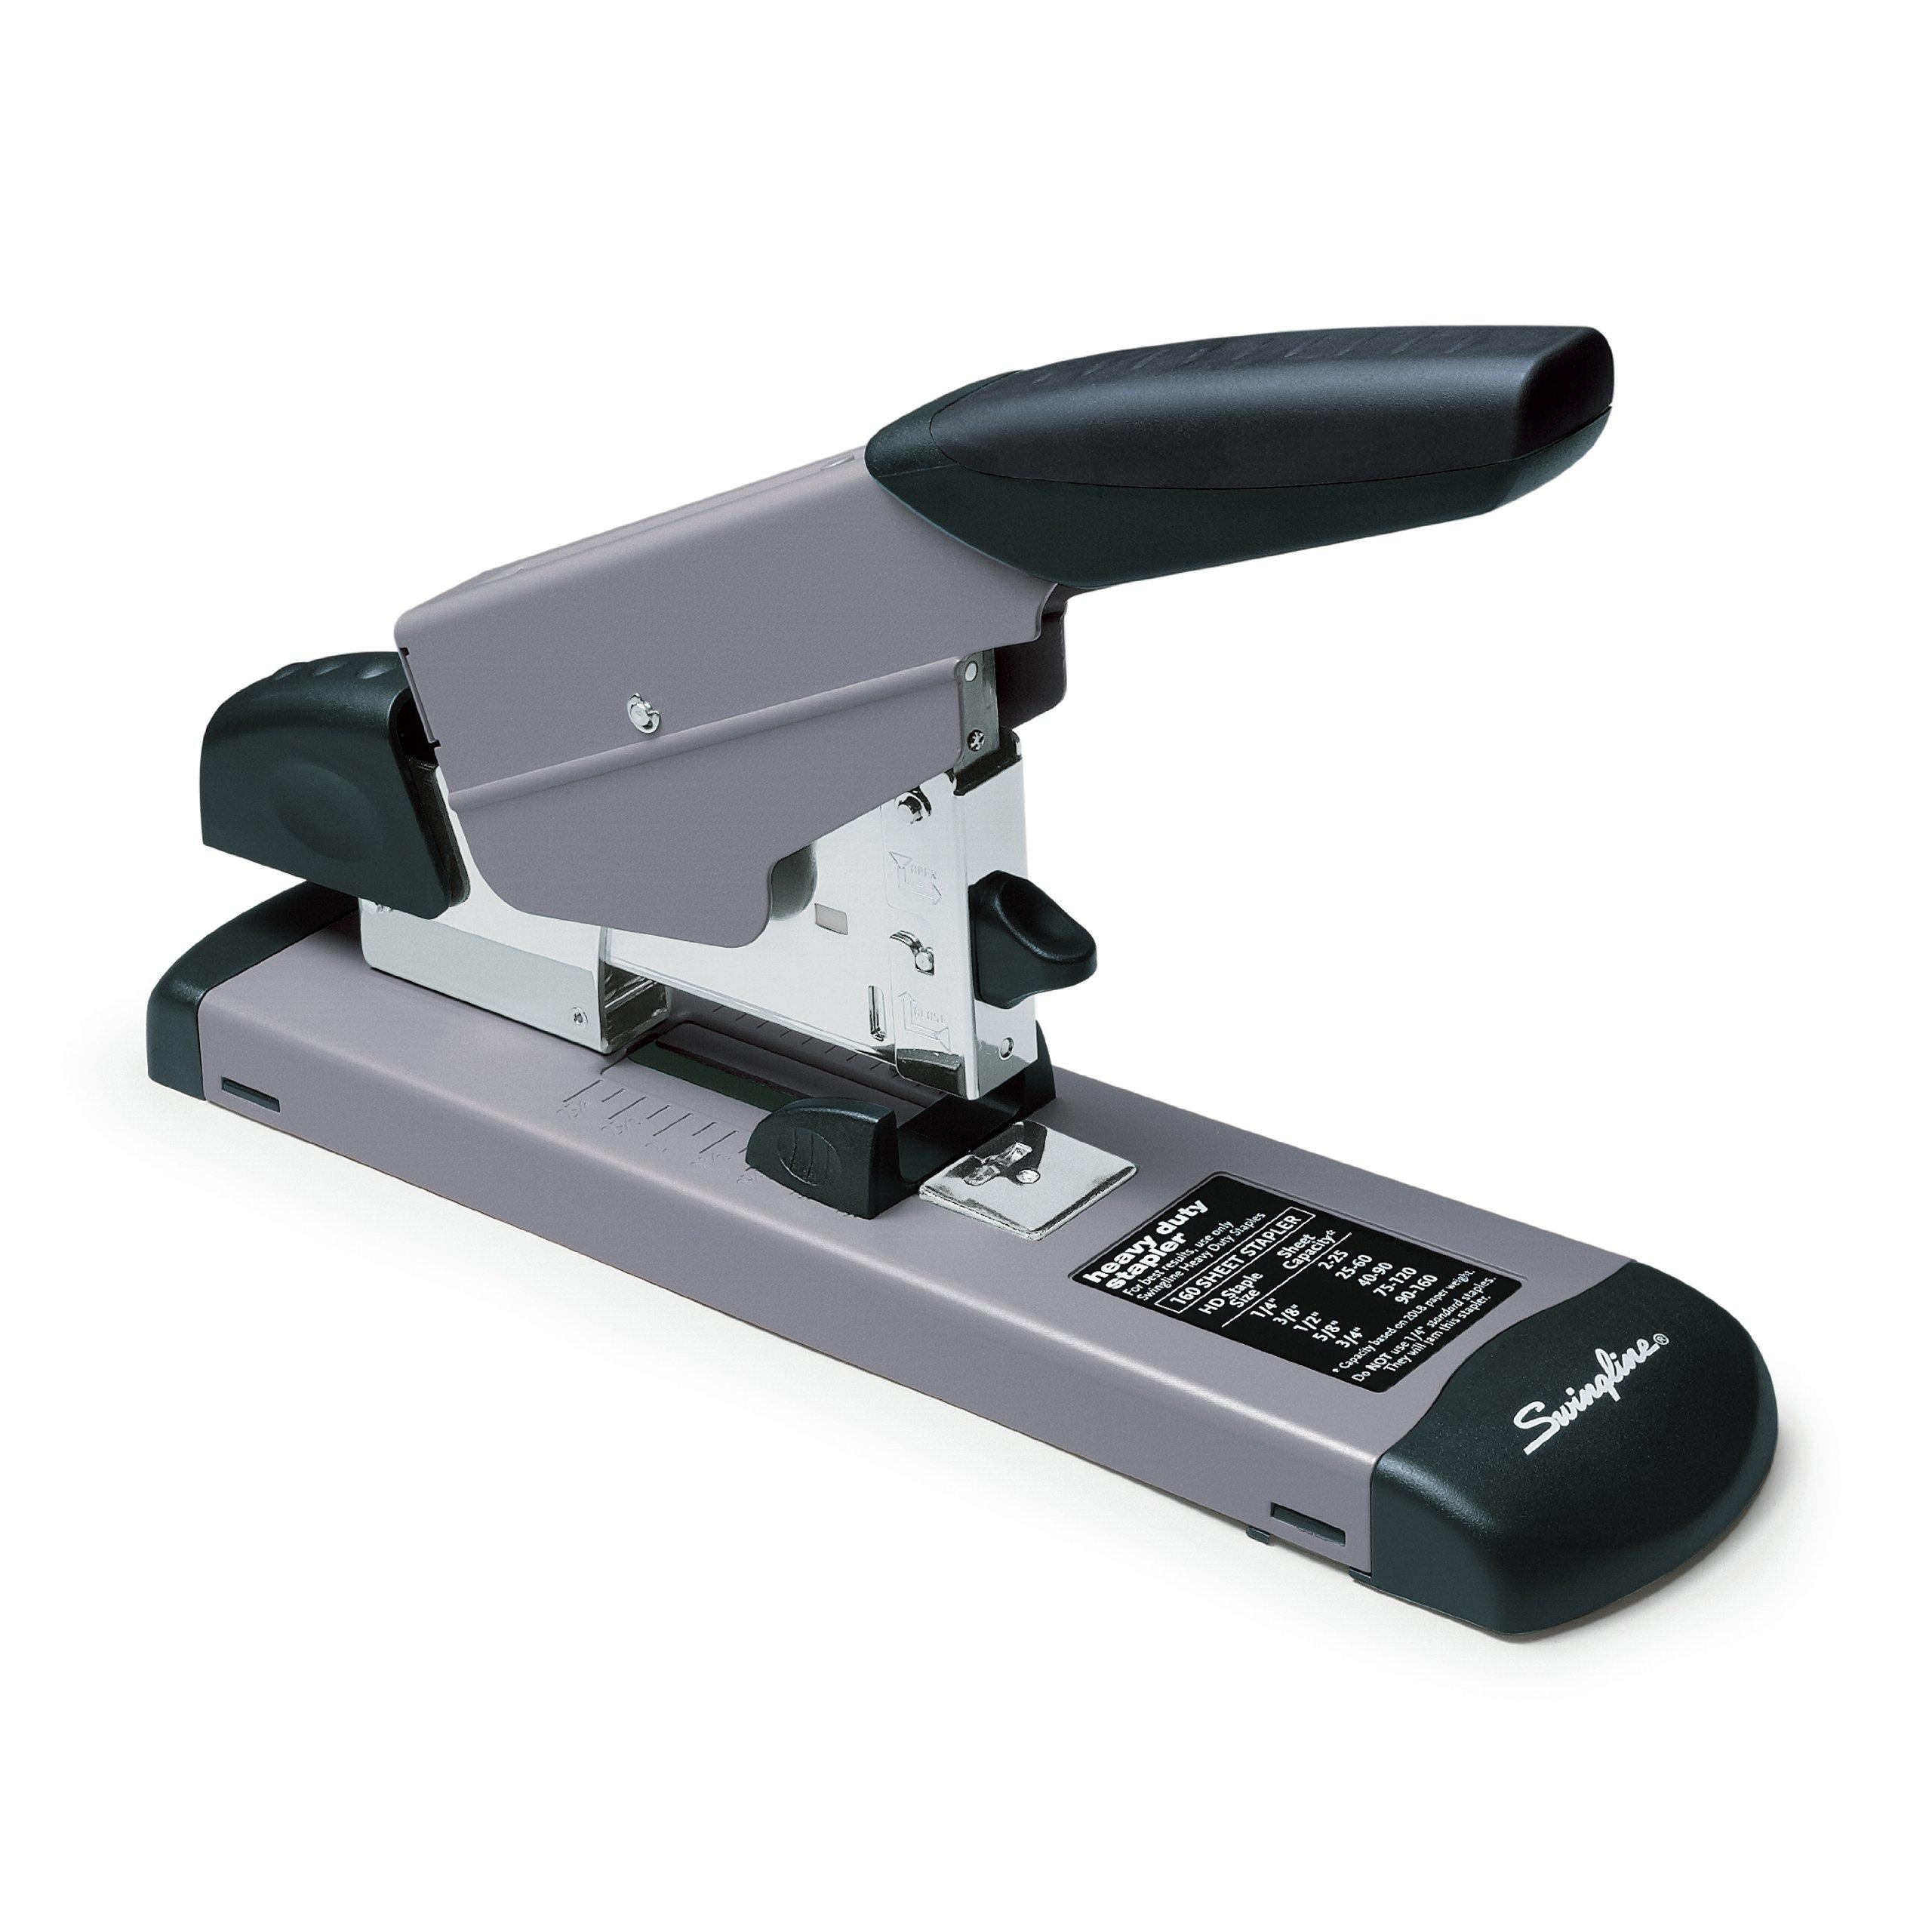 Swingline Heavy Duty Stapler, 160 Sheets Capacity, Desktop, Manual, Black/Gray (S7039005)